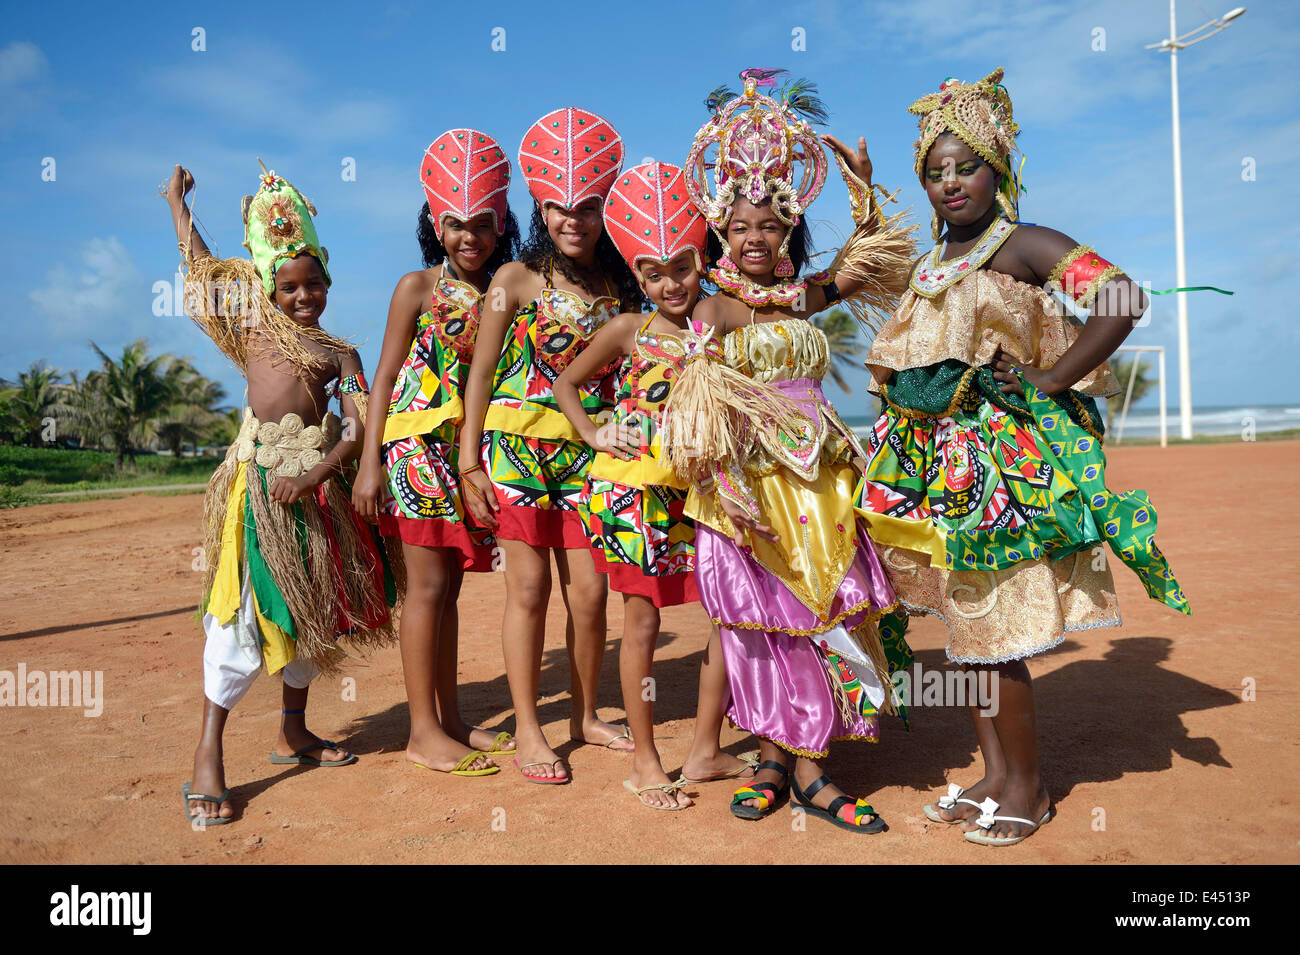 Colourfully dressed children of a traditional Afro-Brazilian musical group, Salvador da Bahia, Bahia, Brazil - Stock Image